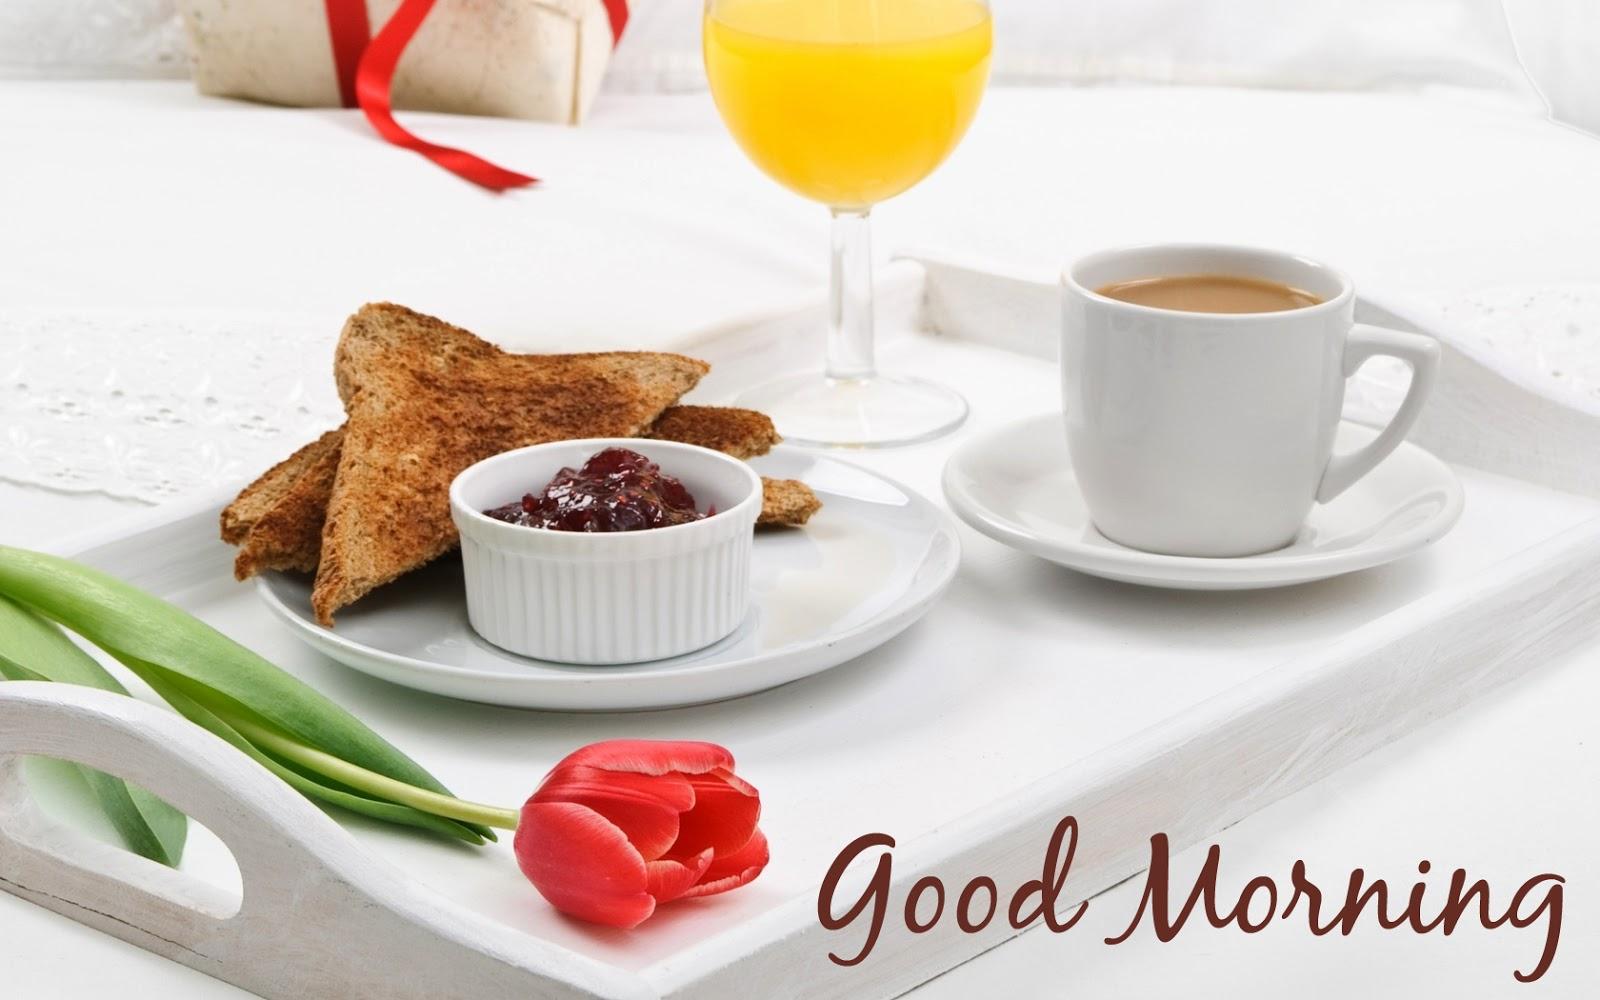 Ravishment: Good Morning  Happy Morning  Have a Nice Day HD